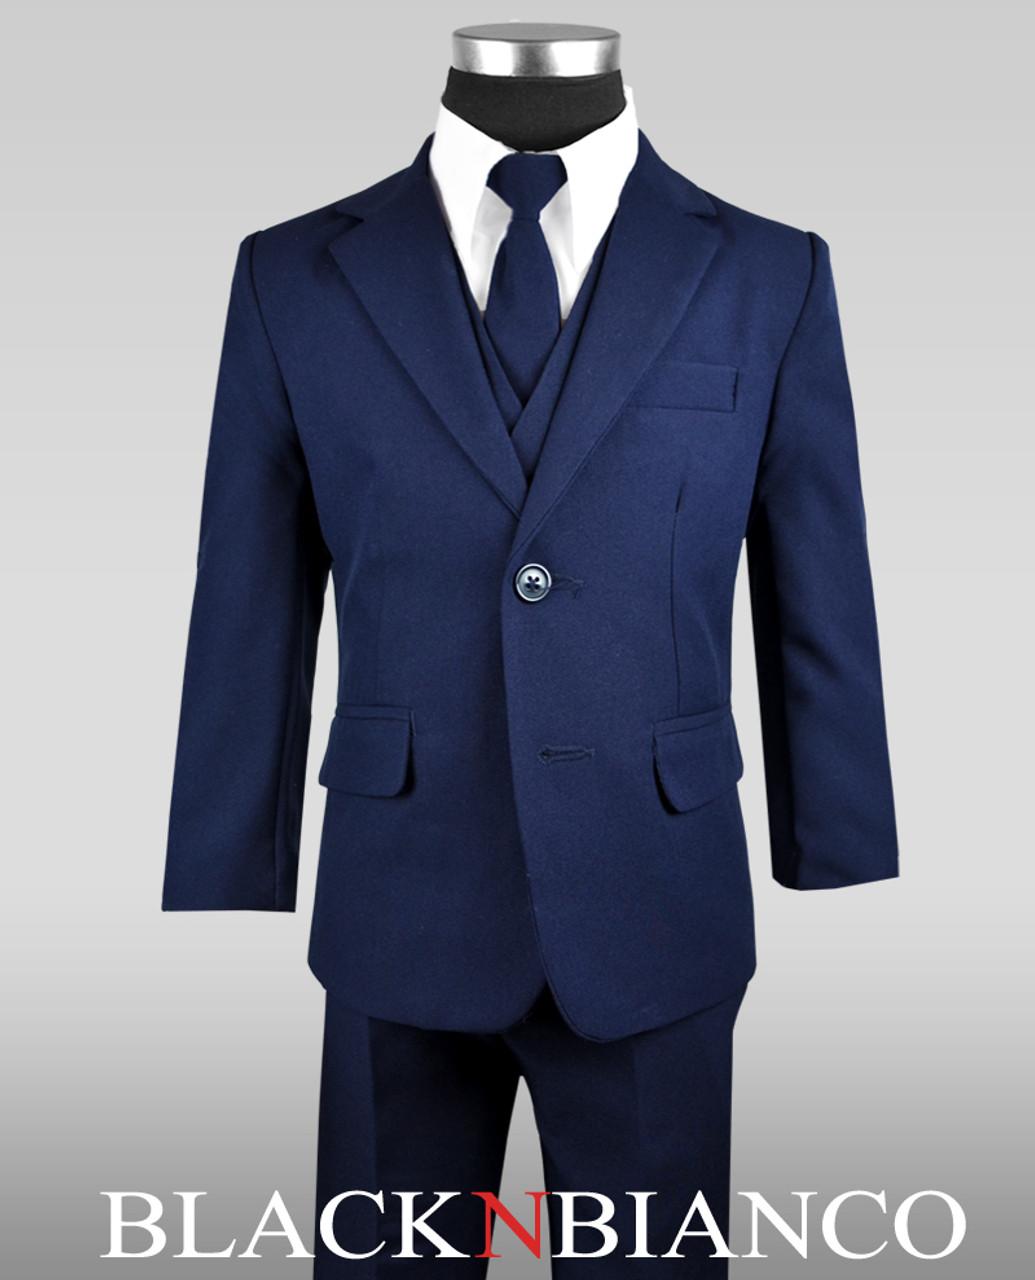 b65918702017ba Boy's Navy Suit With Tie, Vest, Shirt and Slacks | Black N Bianco ...